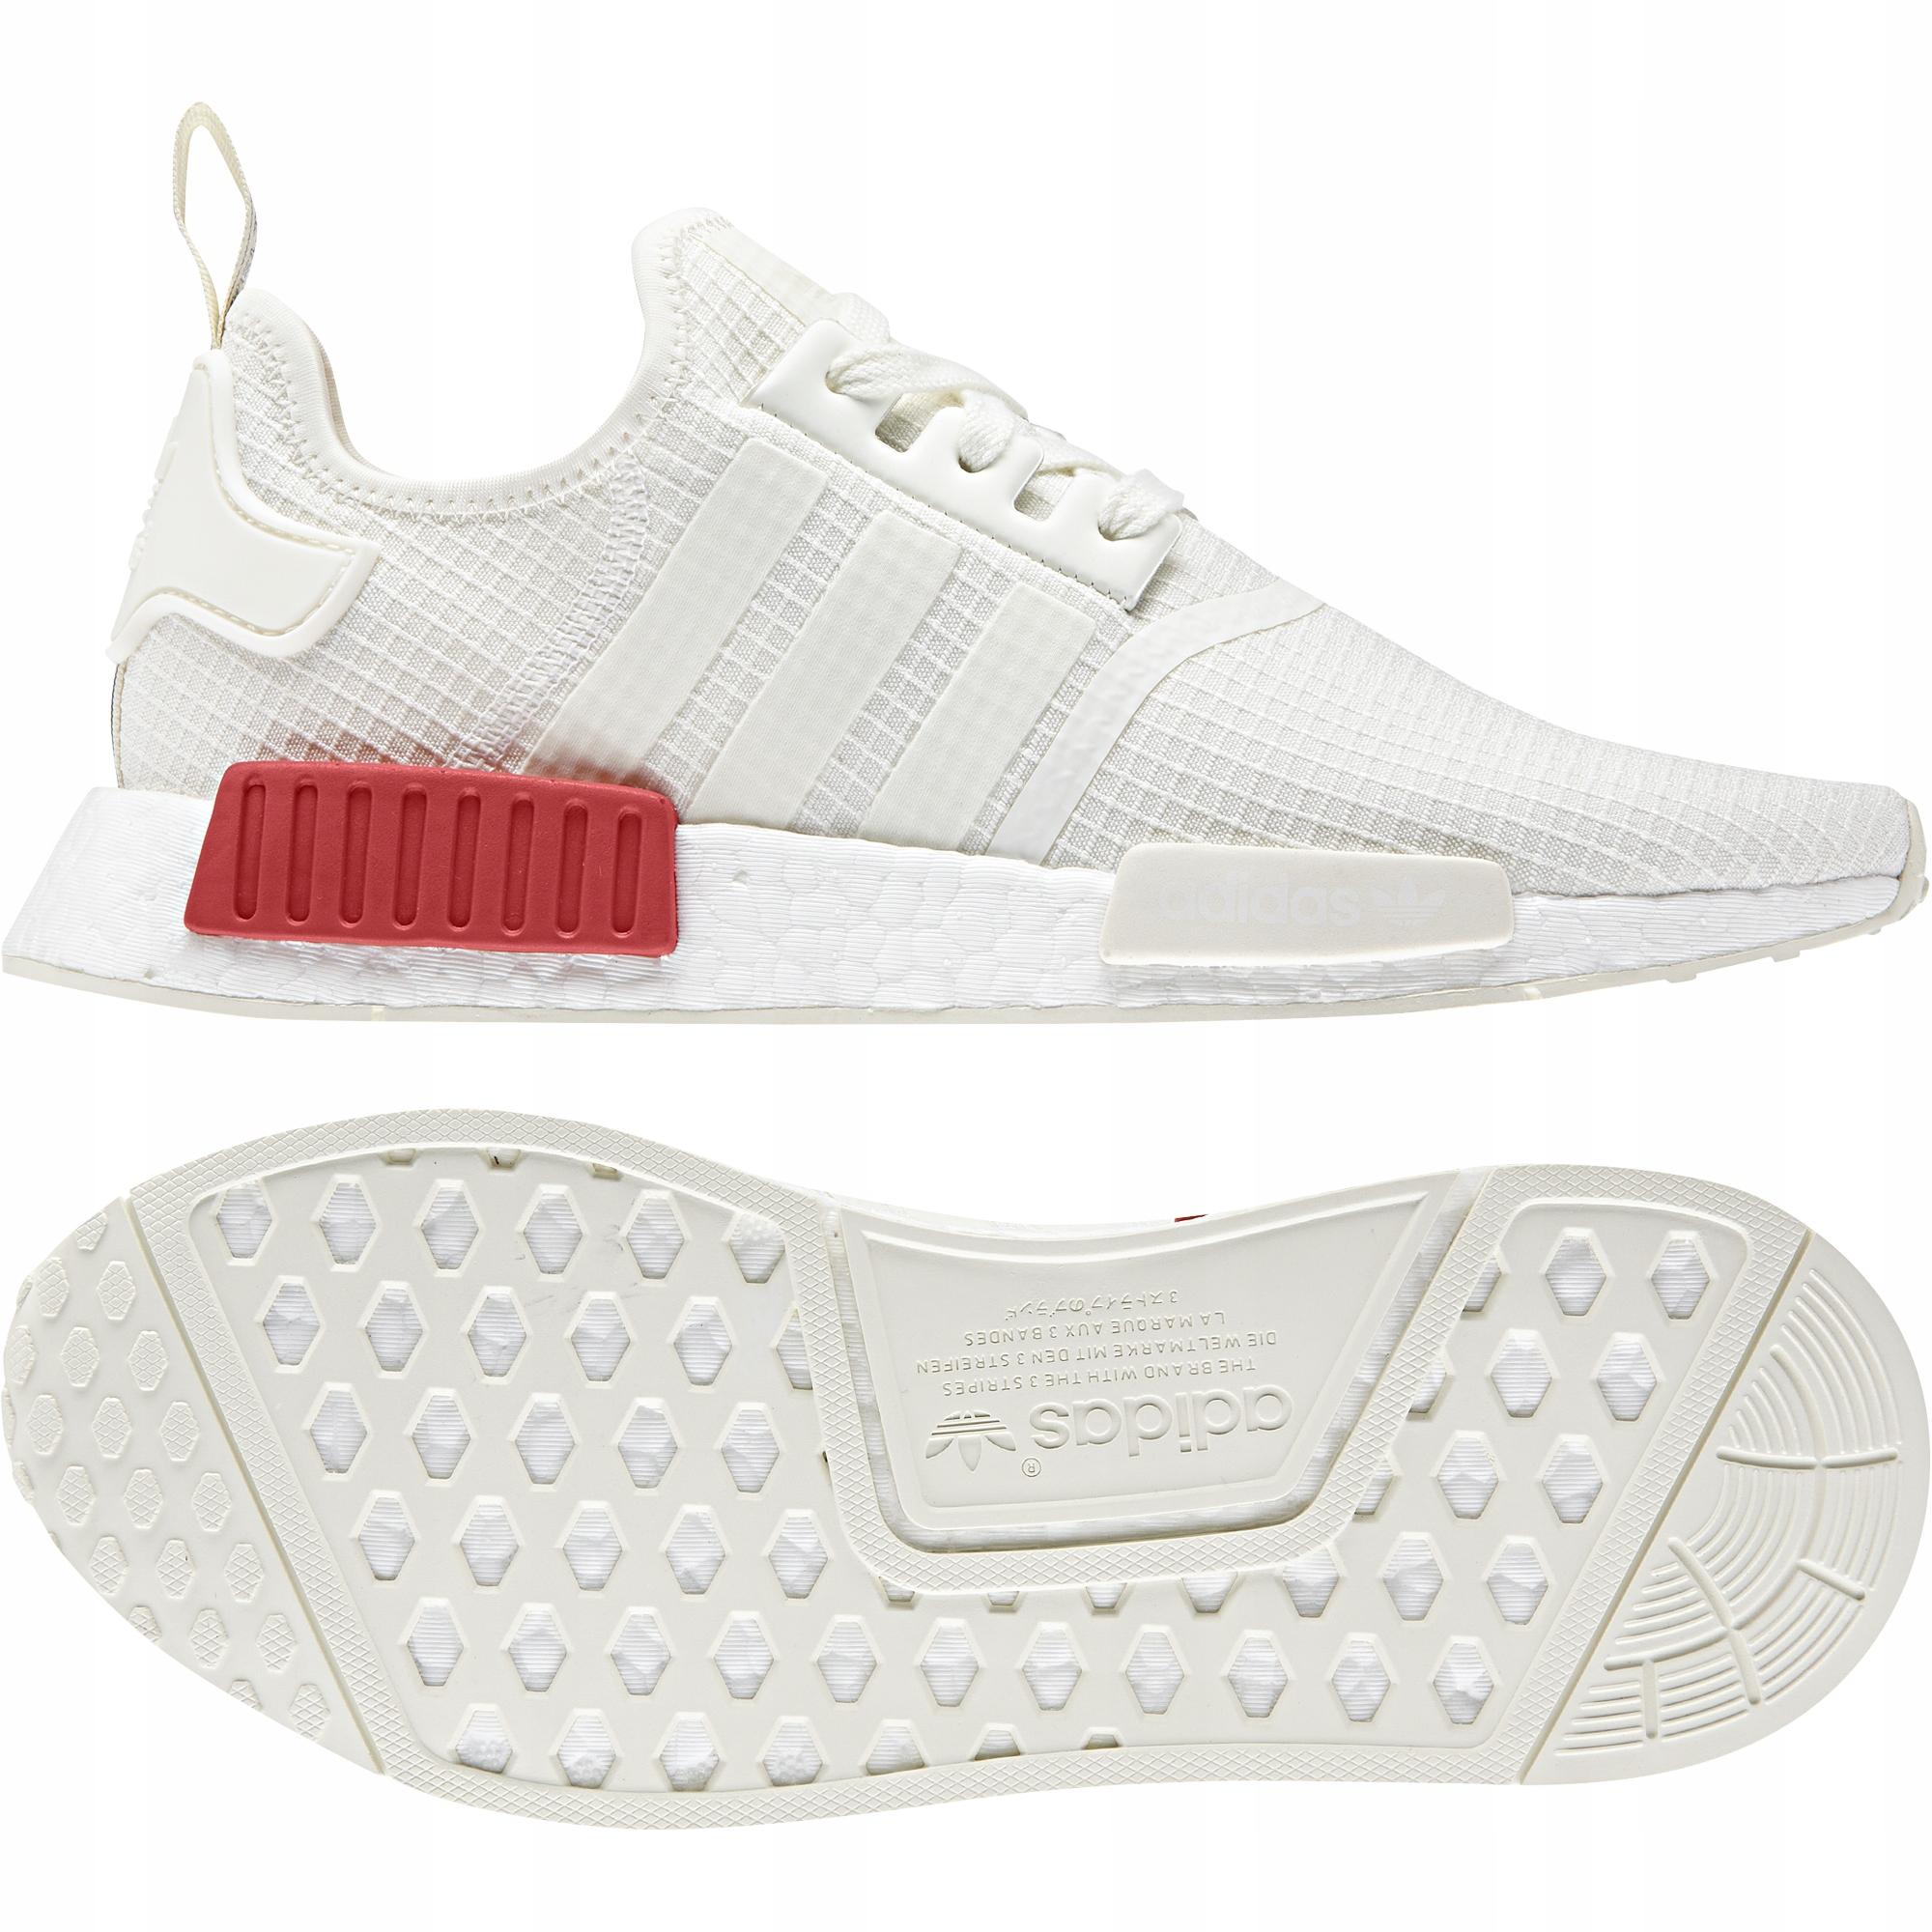 adidas Originals NMD_R1 S76907 buty damskie Podeszwa.pl